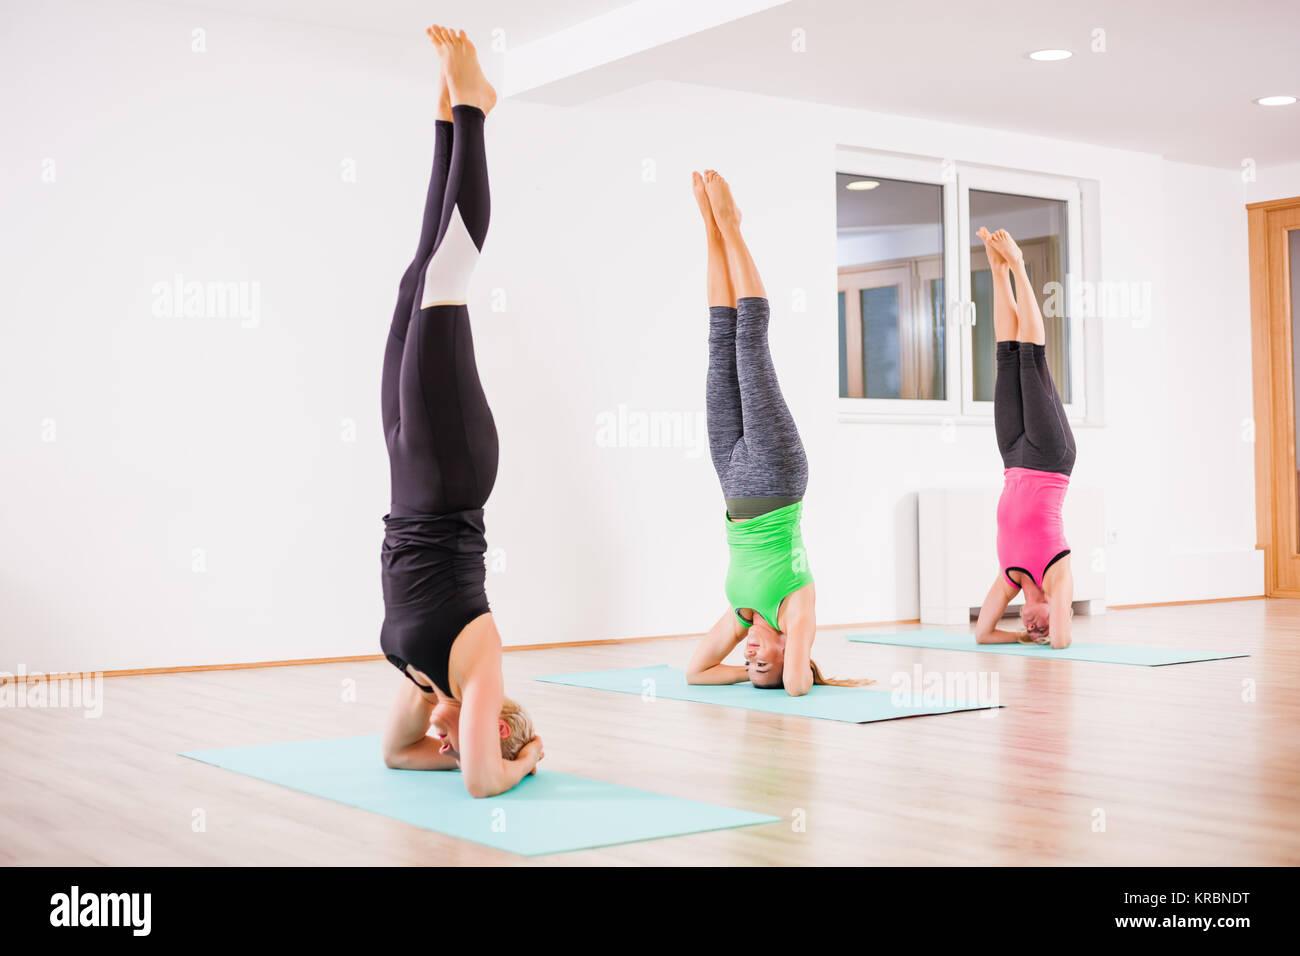 Three girls practicing yoga, Sirsasana / Headstand pose - Stock Image